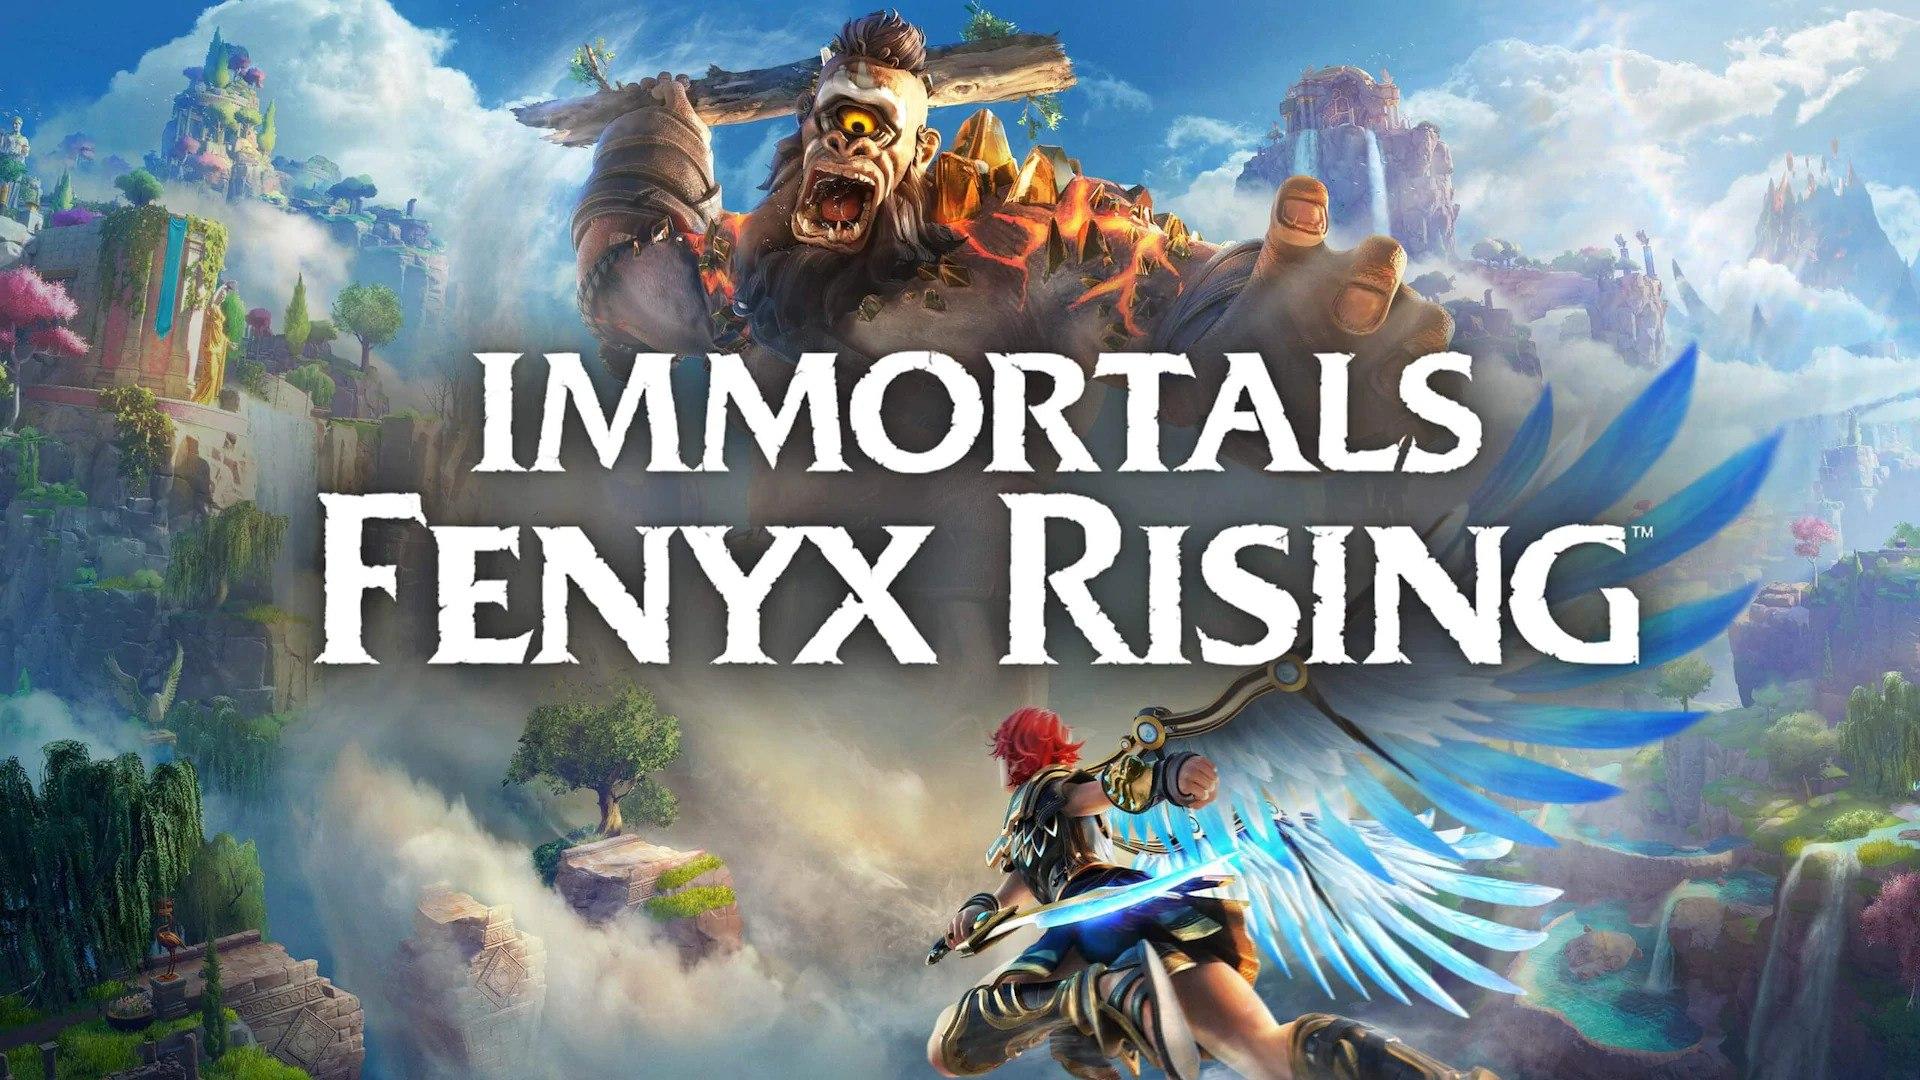 Le deuxième DLC Myths of the Eastern Realm d'Immortals Fenyx Rising obtient la date de sortie en mars